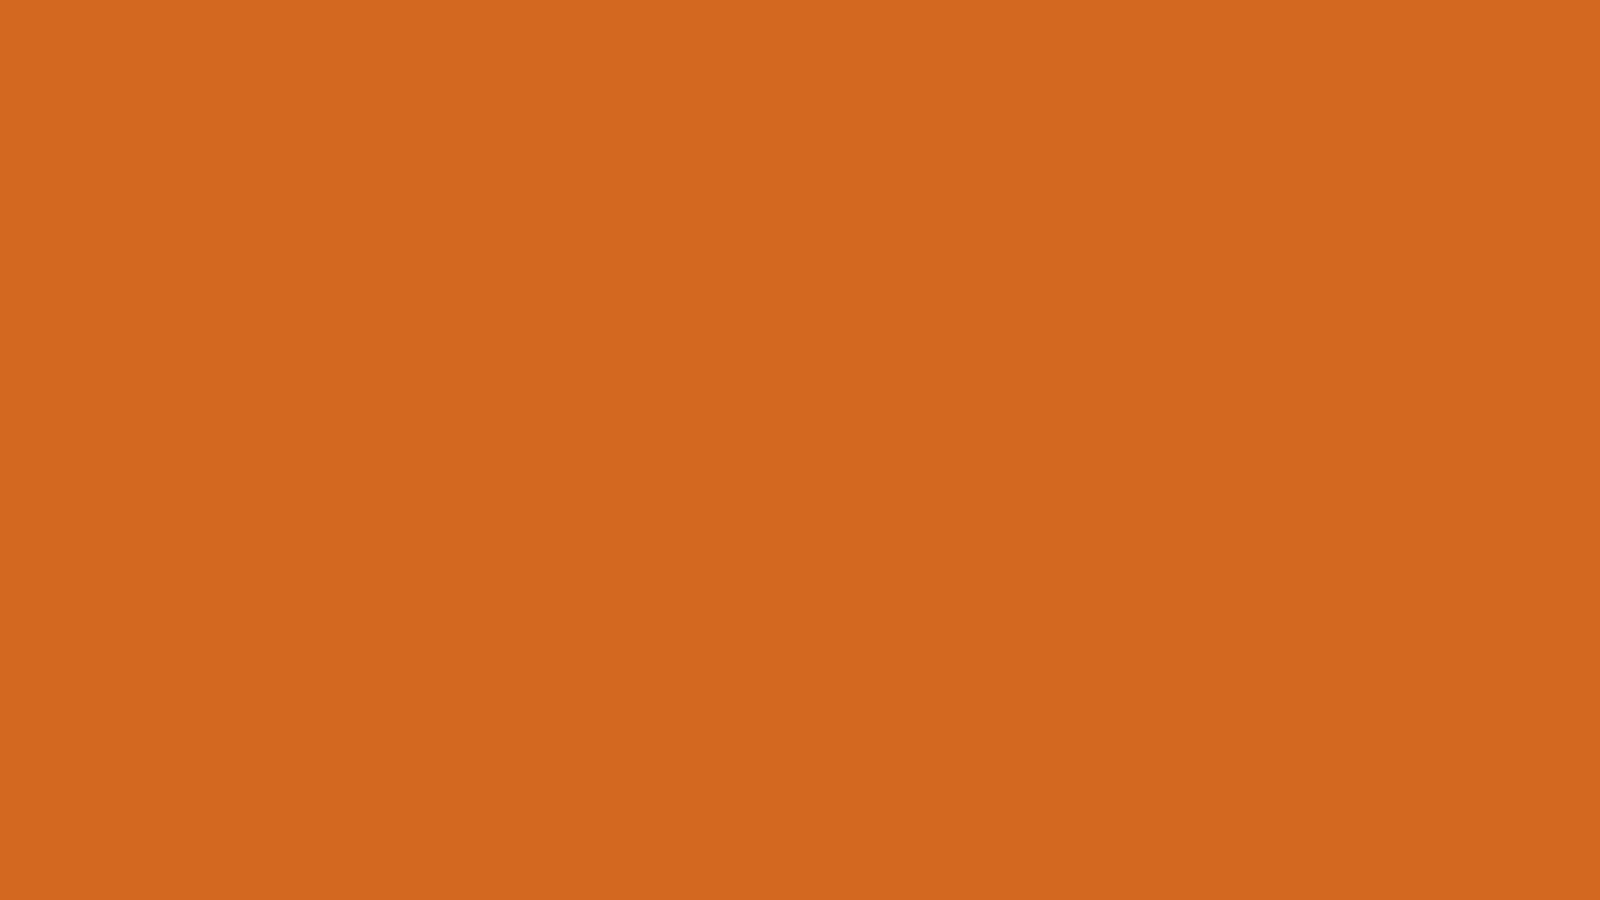 1600x900 Cinnamon Solid Color Background